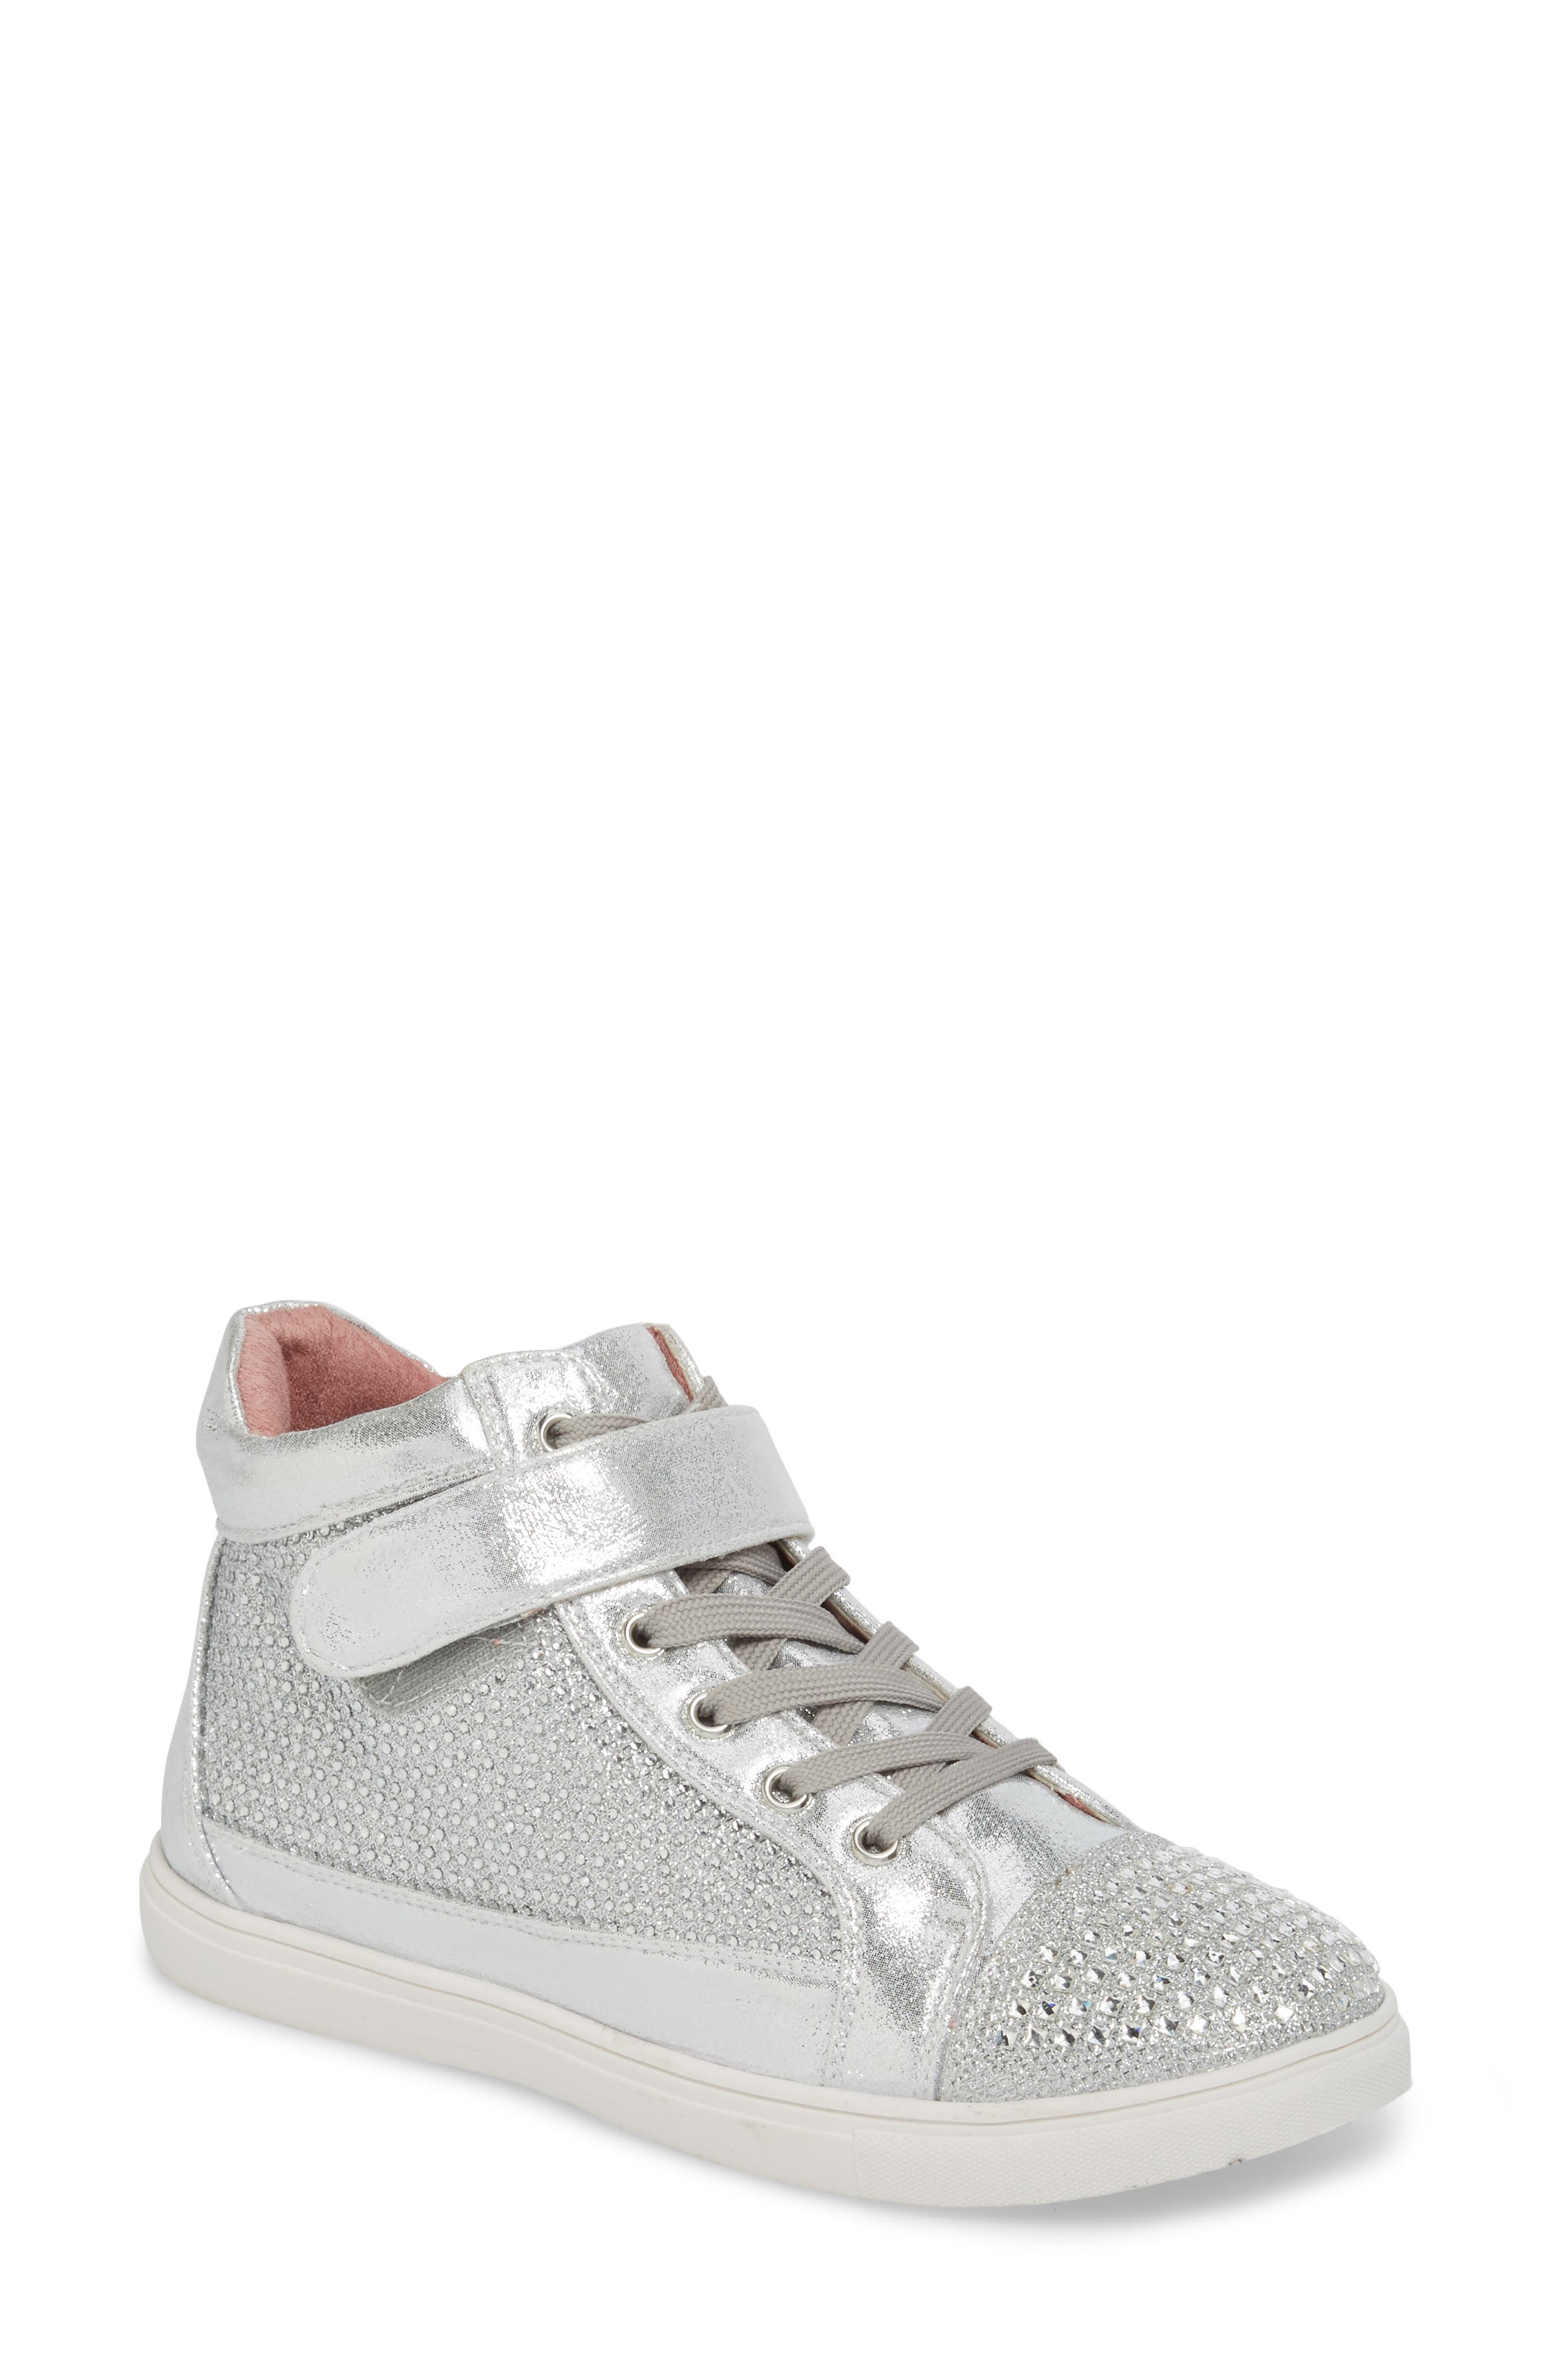 Lauren Lorraine Charley Crystal Embellished High Top Sneaker (Women)